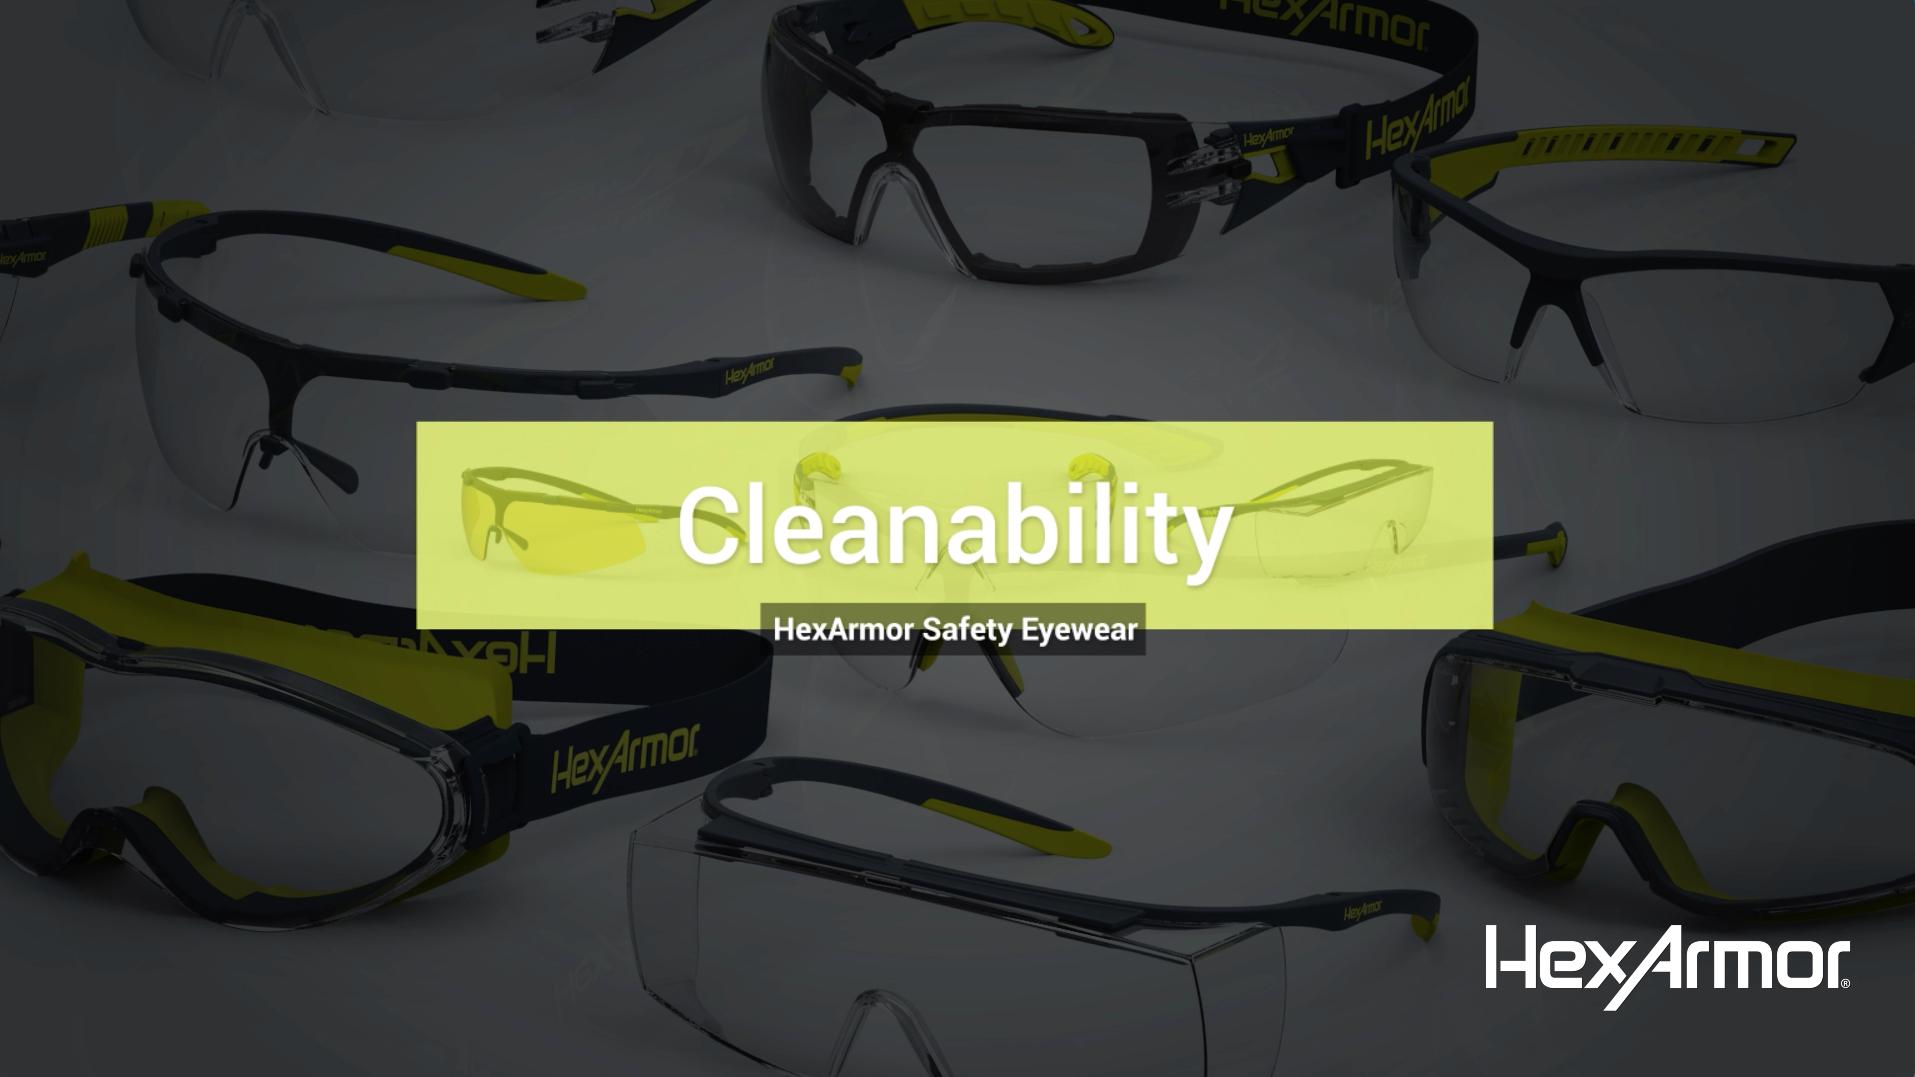 Cleanability —HexArmor Safety Eyewear